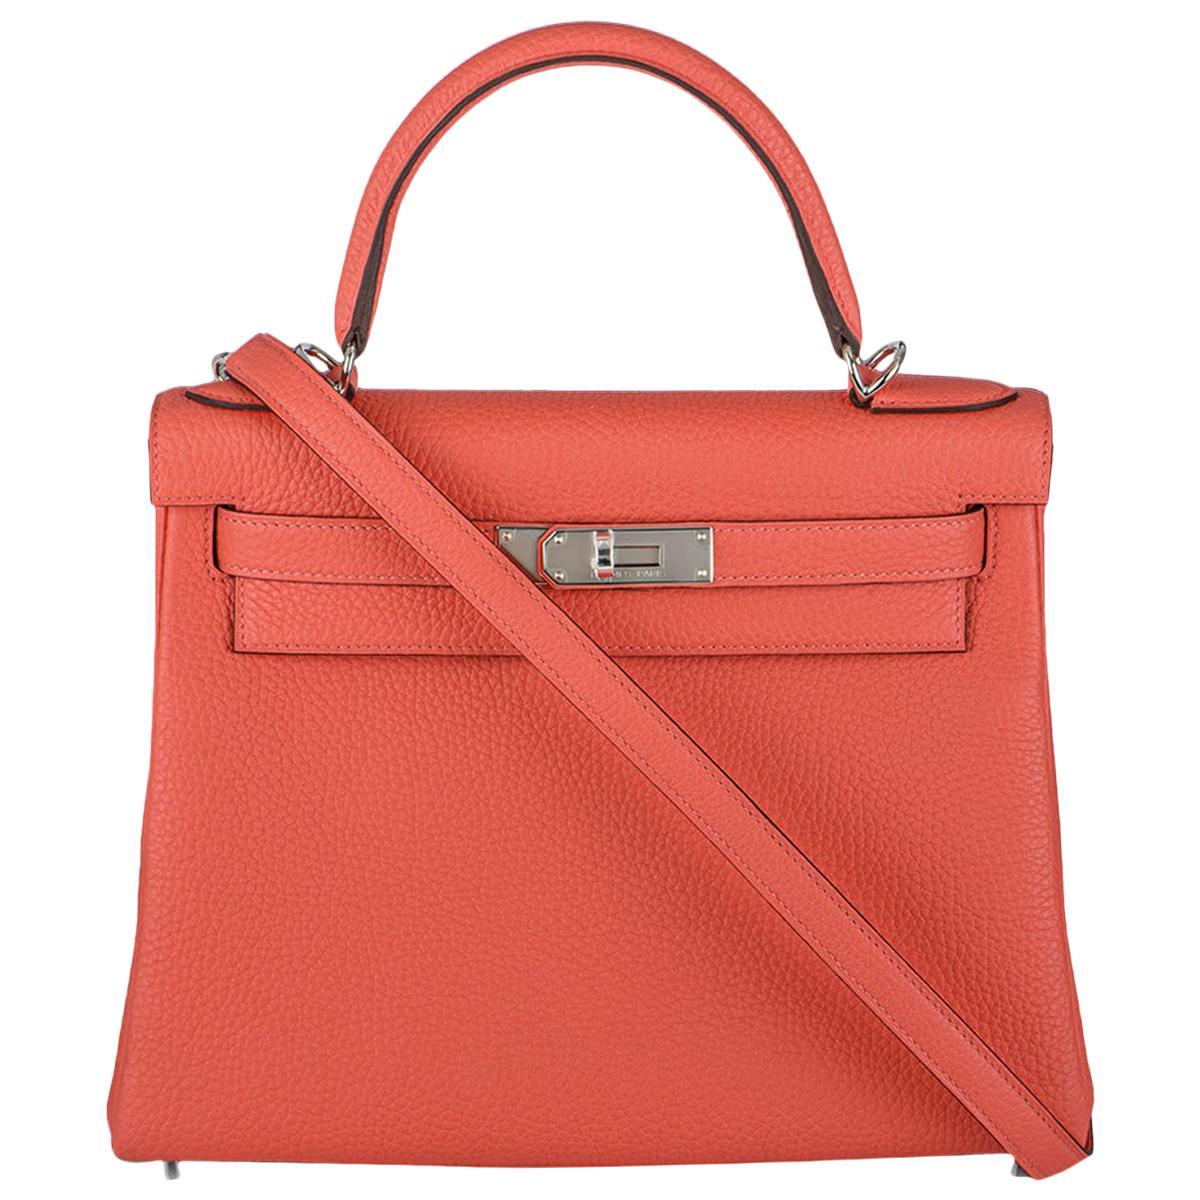 Hermès Kelly II Retourne 28cm Rose Texas Clemence PHW Handbag